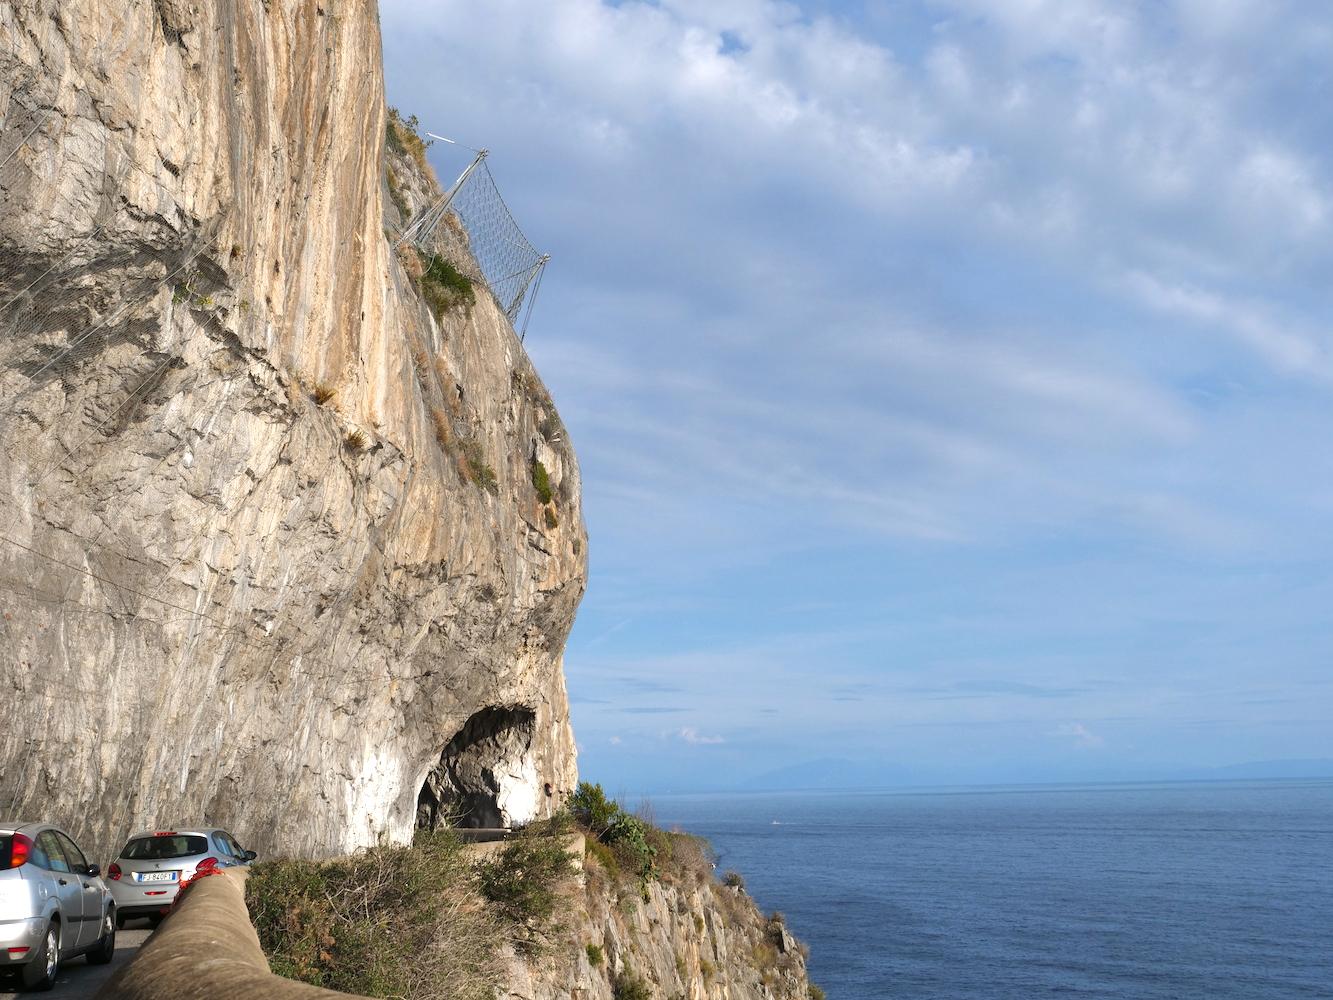 Cutting into a cliffside tunnel on the Amalfi Coast.